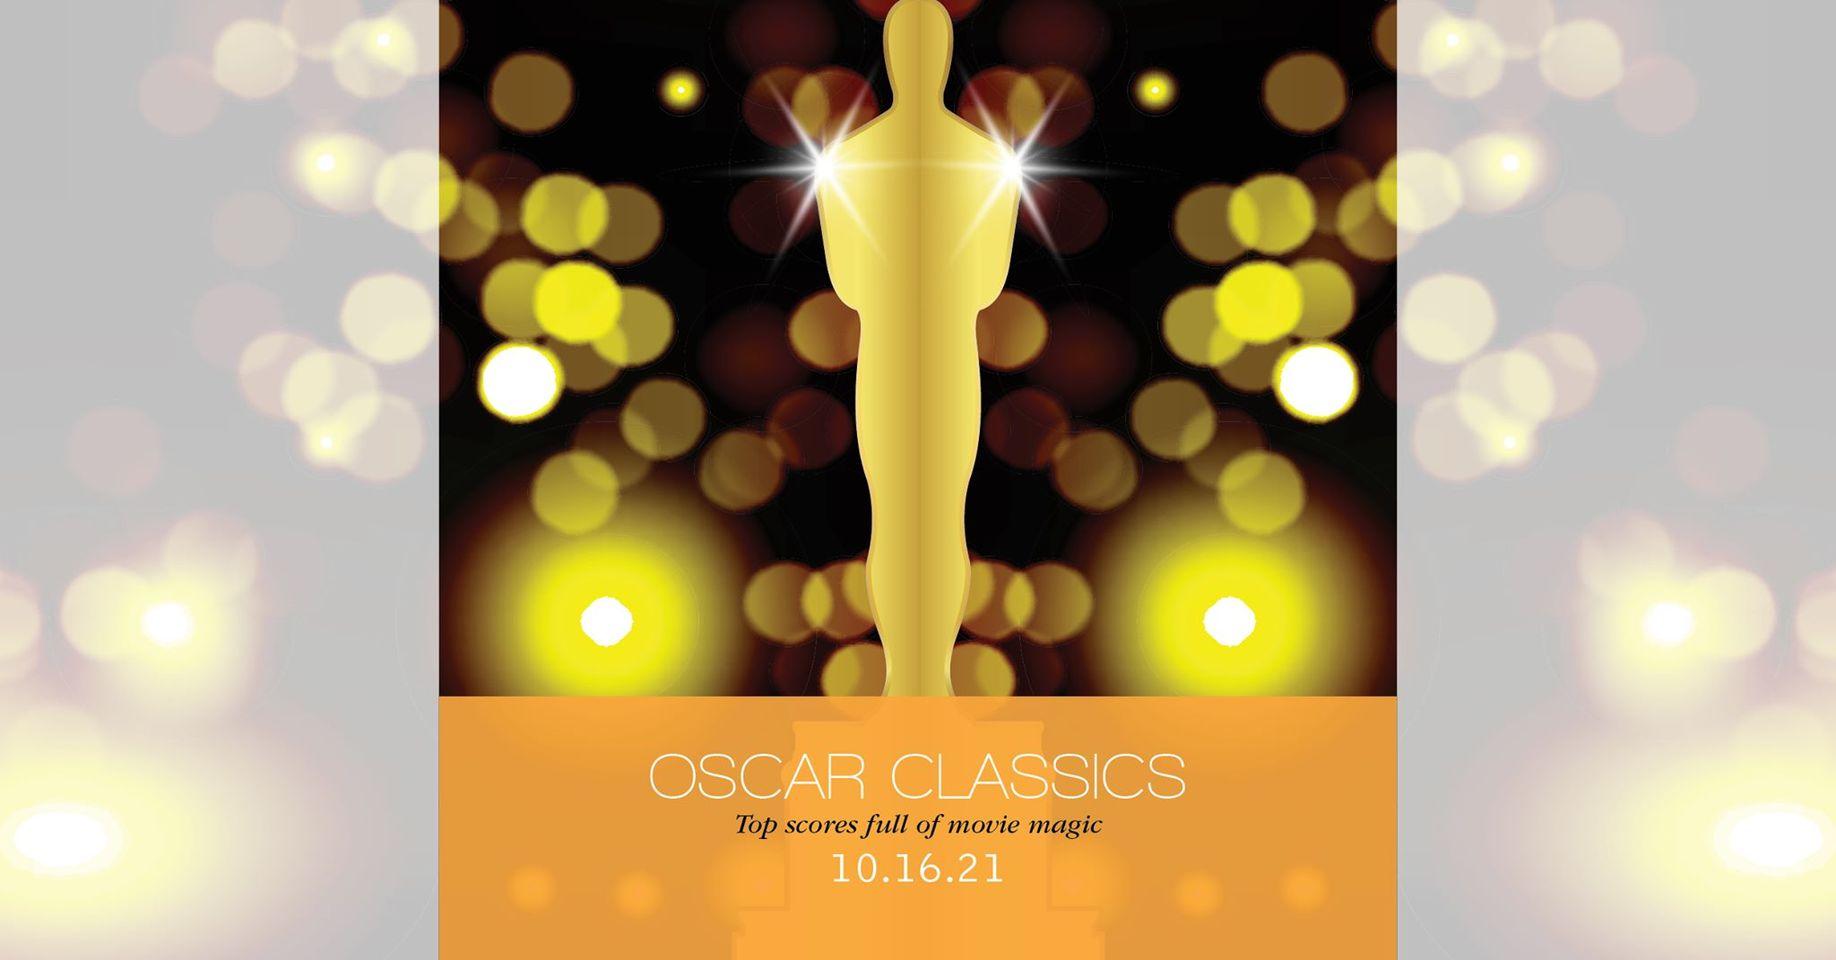 Mississippi Symphony Orchestra's Pops I – Oscar Classics